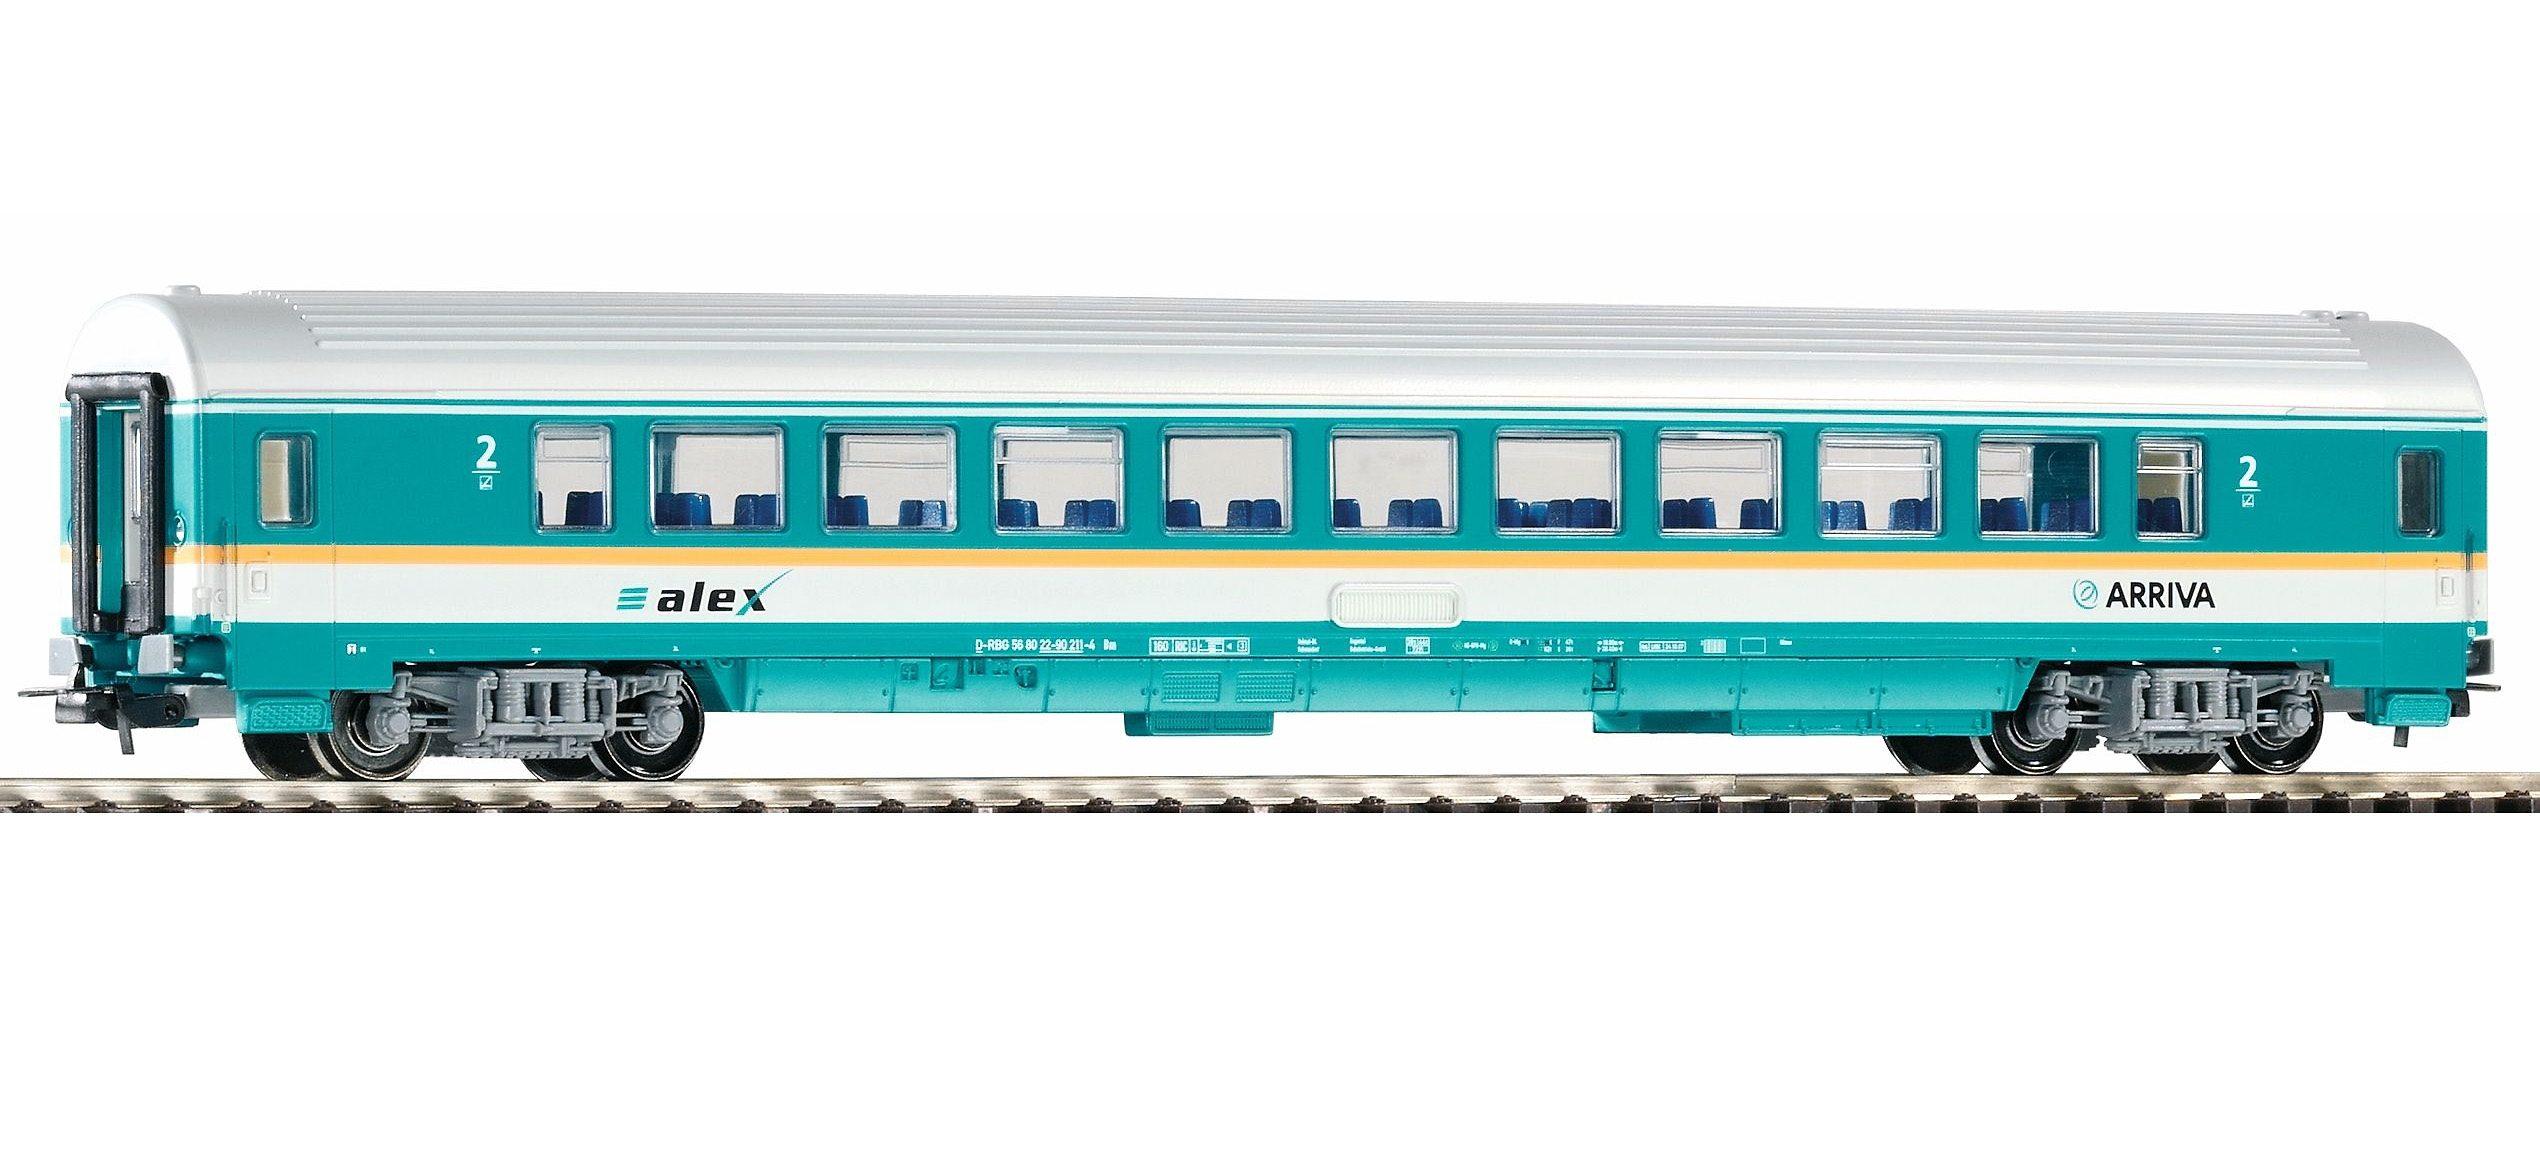 PIKO Personenwagen Waggon Arriva 2. Klasse, Spur H0